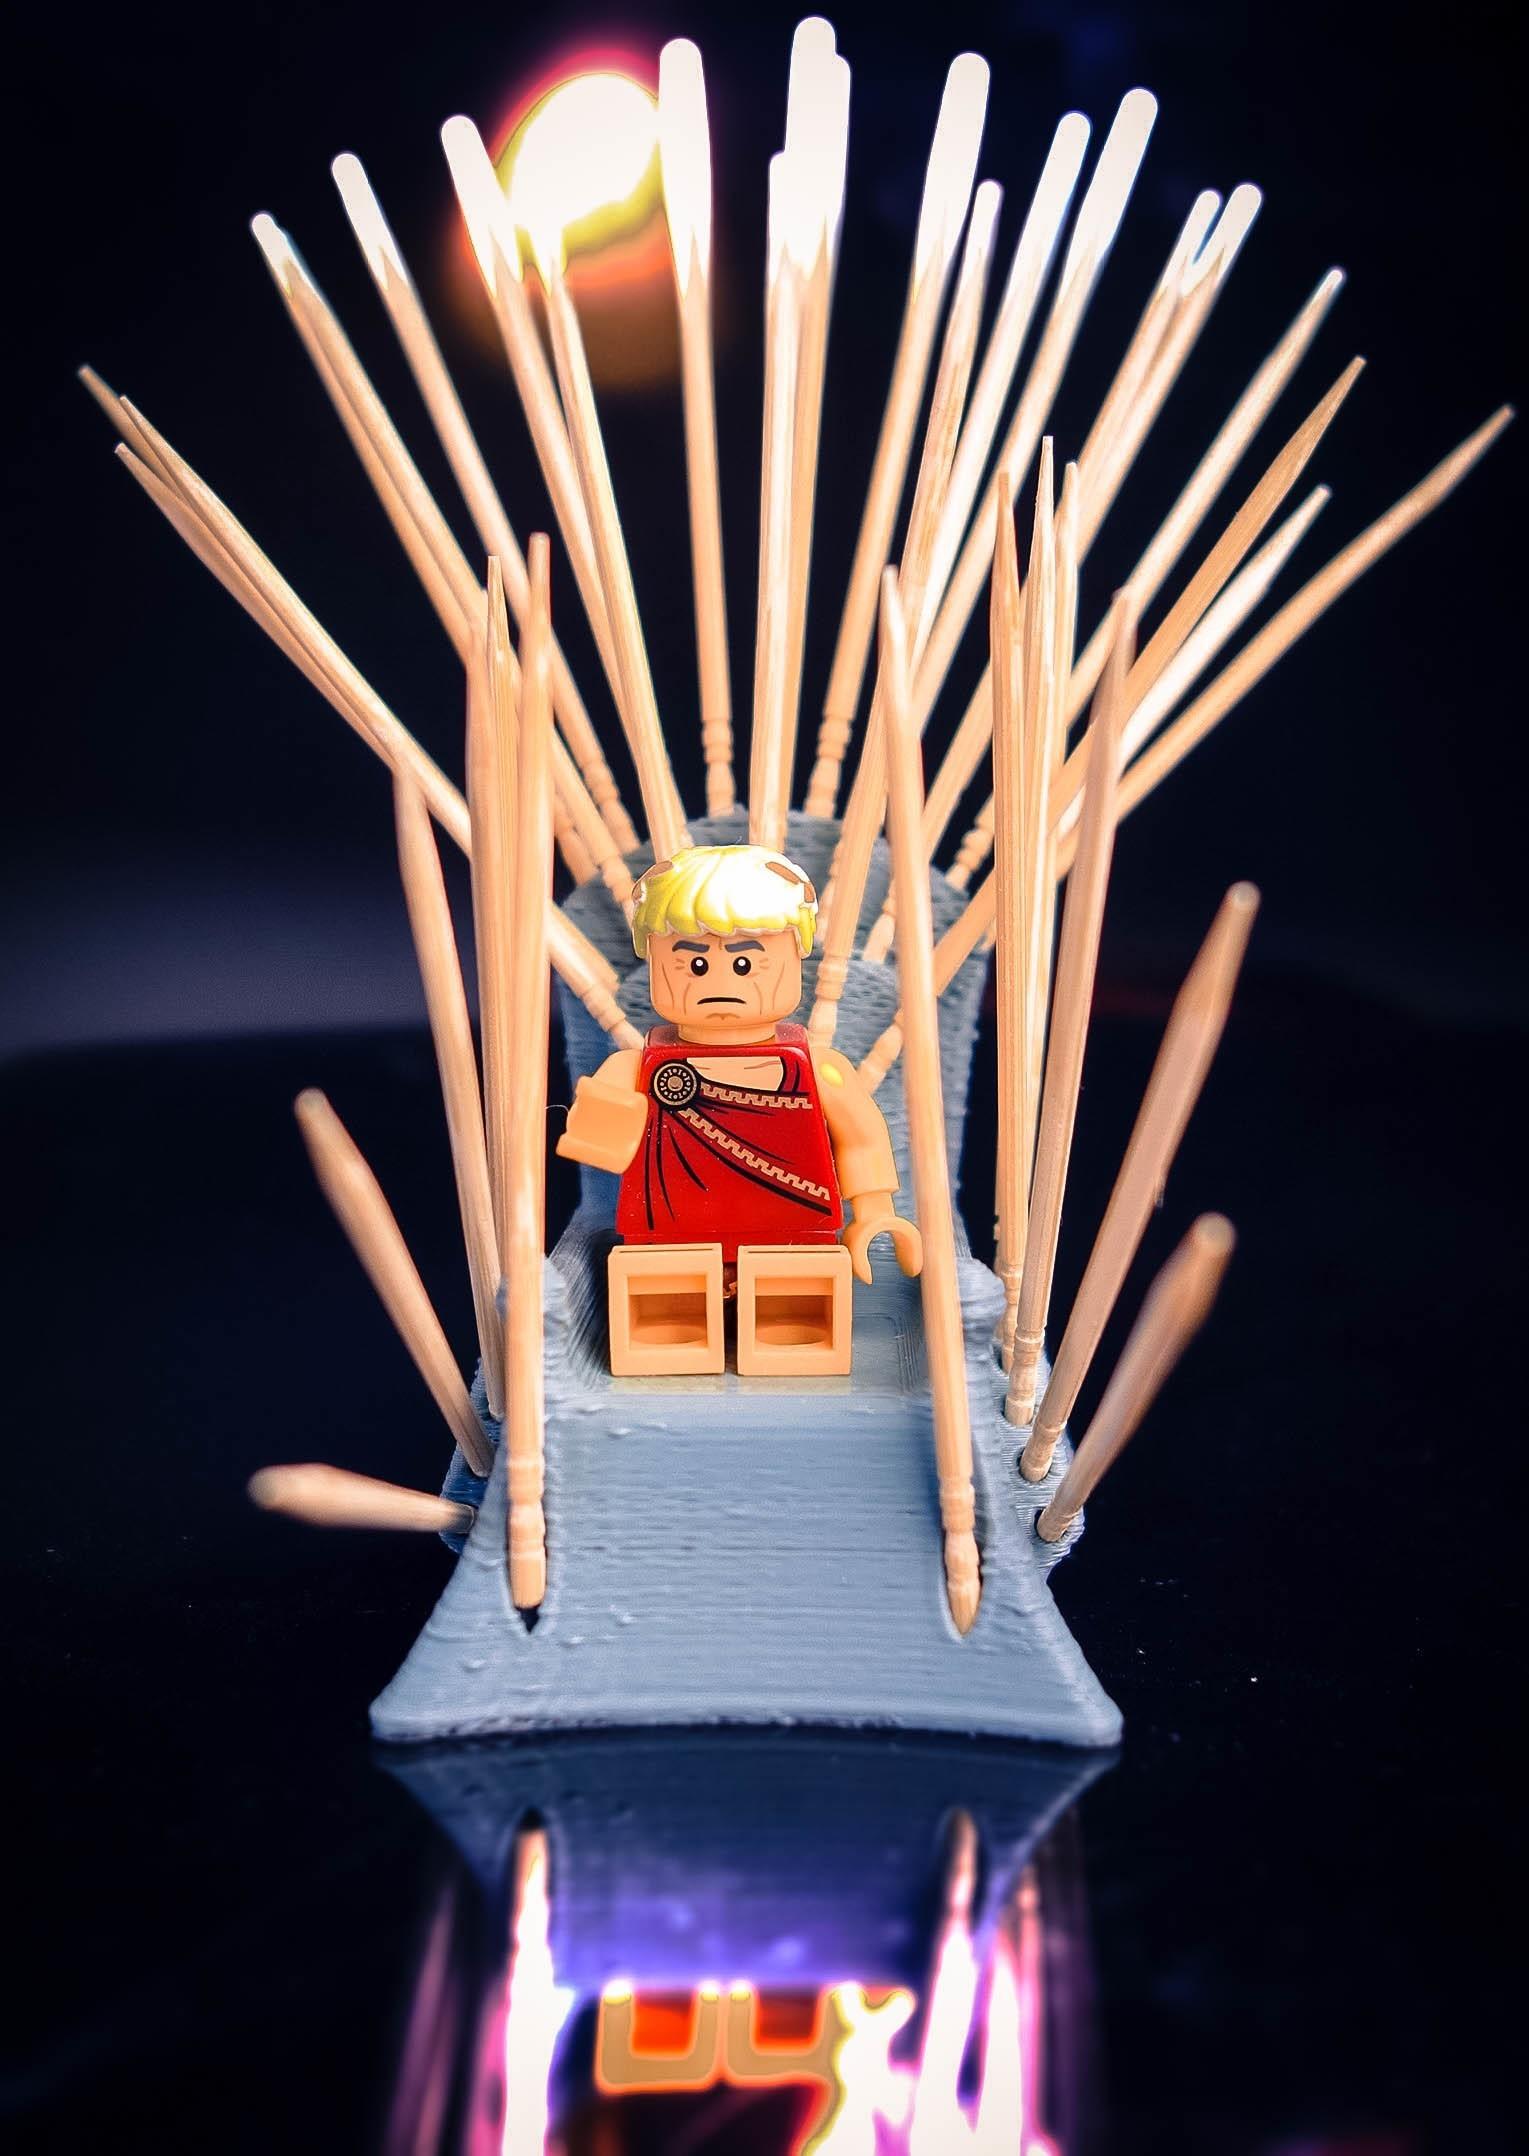 20180506-Netpicks1c.jpg Download STL file Wooden Throne • 3D printer object, ralphzoontjens